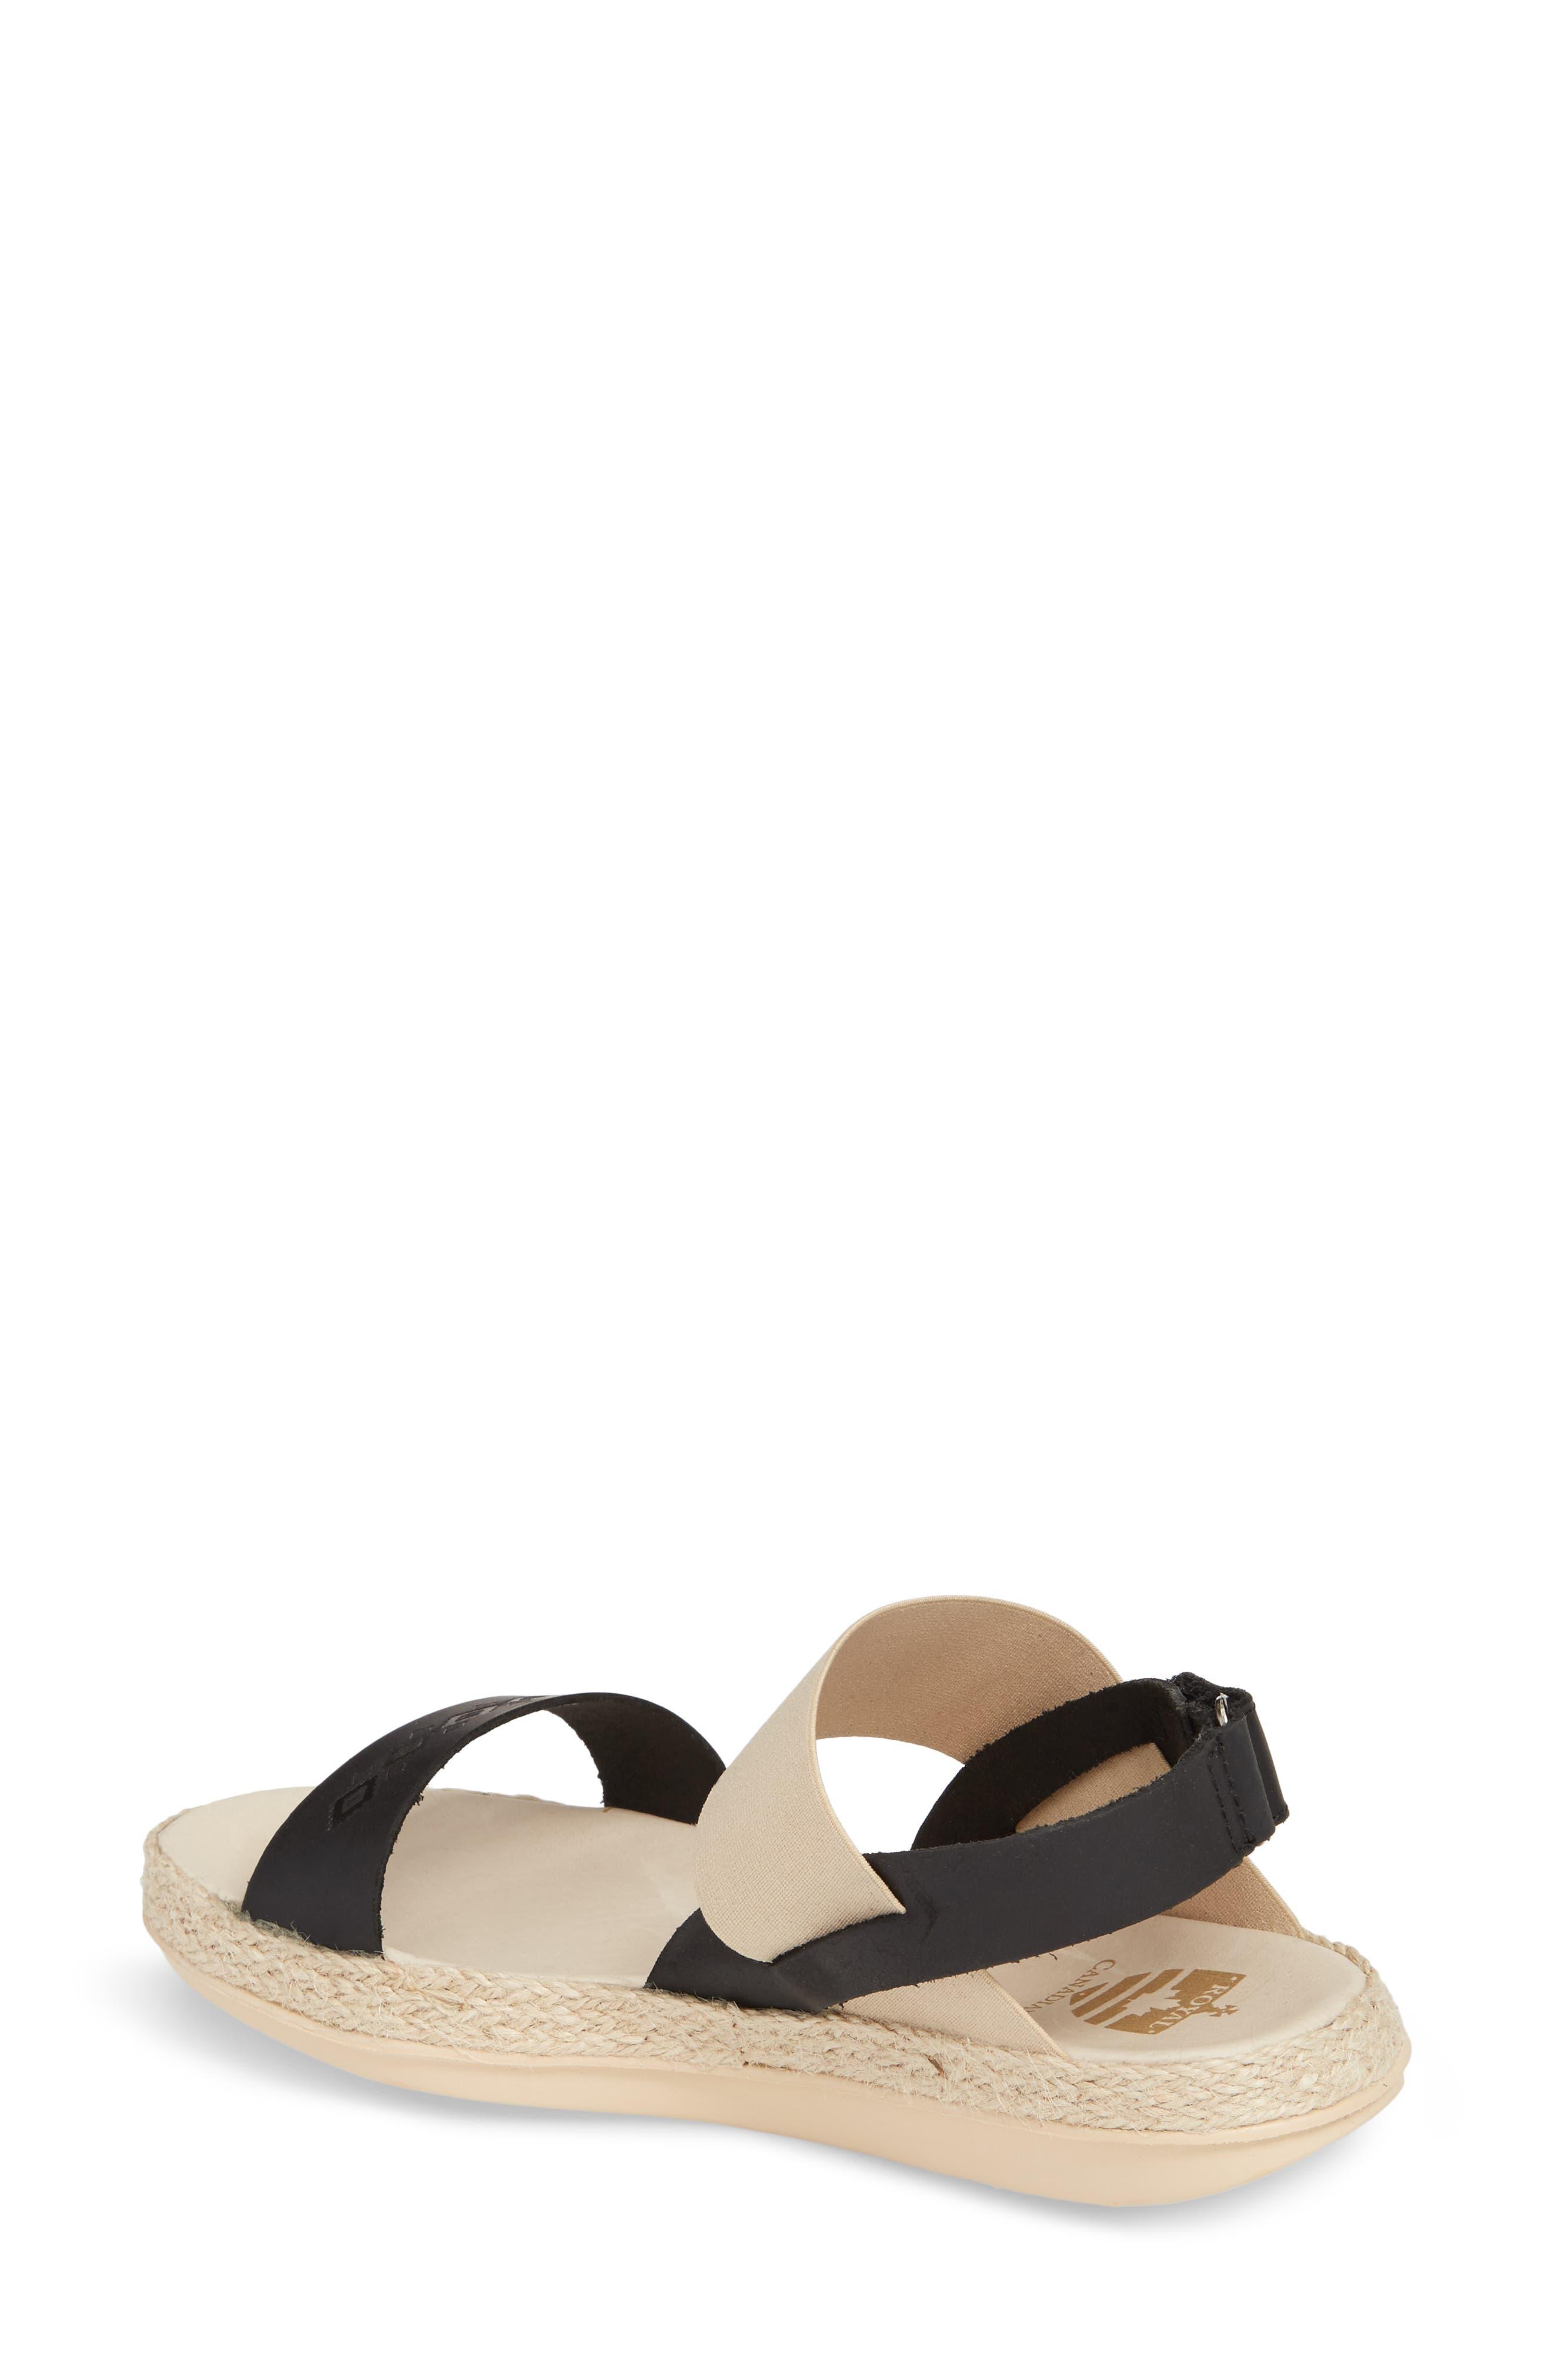 Tobermory Sandal,                             Alternate thumbnail 2, color,                             Black Leather